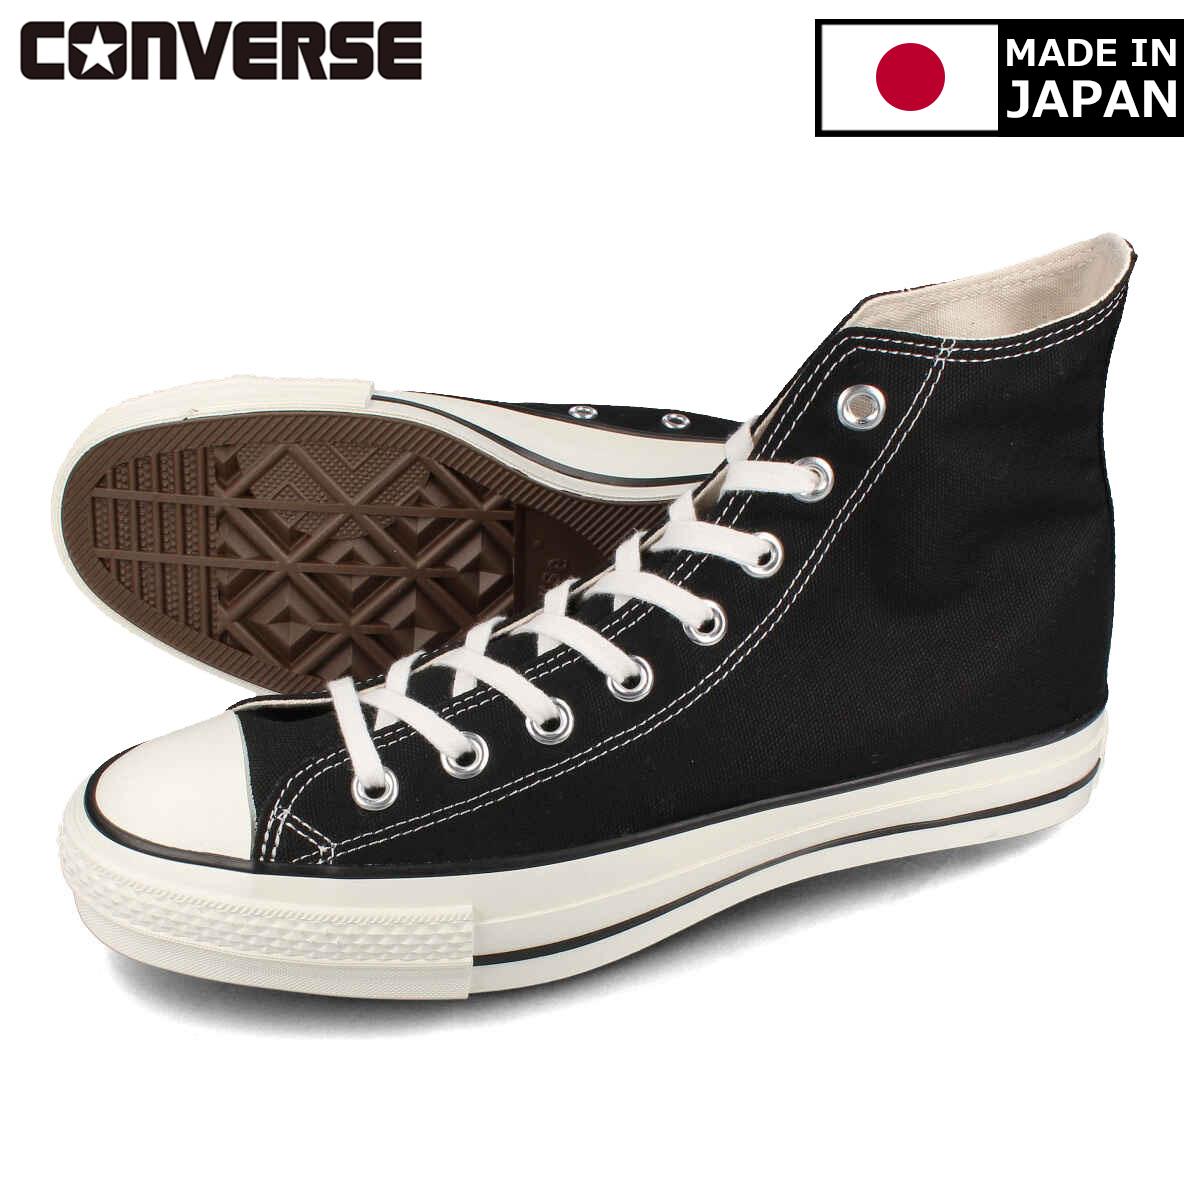 CONVERSE CANVAS ALL STAR J HI 【MADE IN JAPAN】【日本製】 コンバース オールスター J HI BLACK